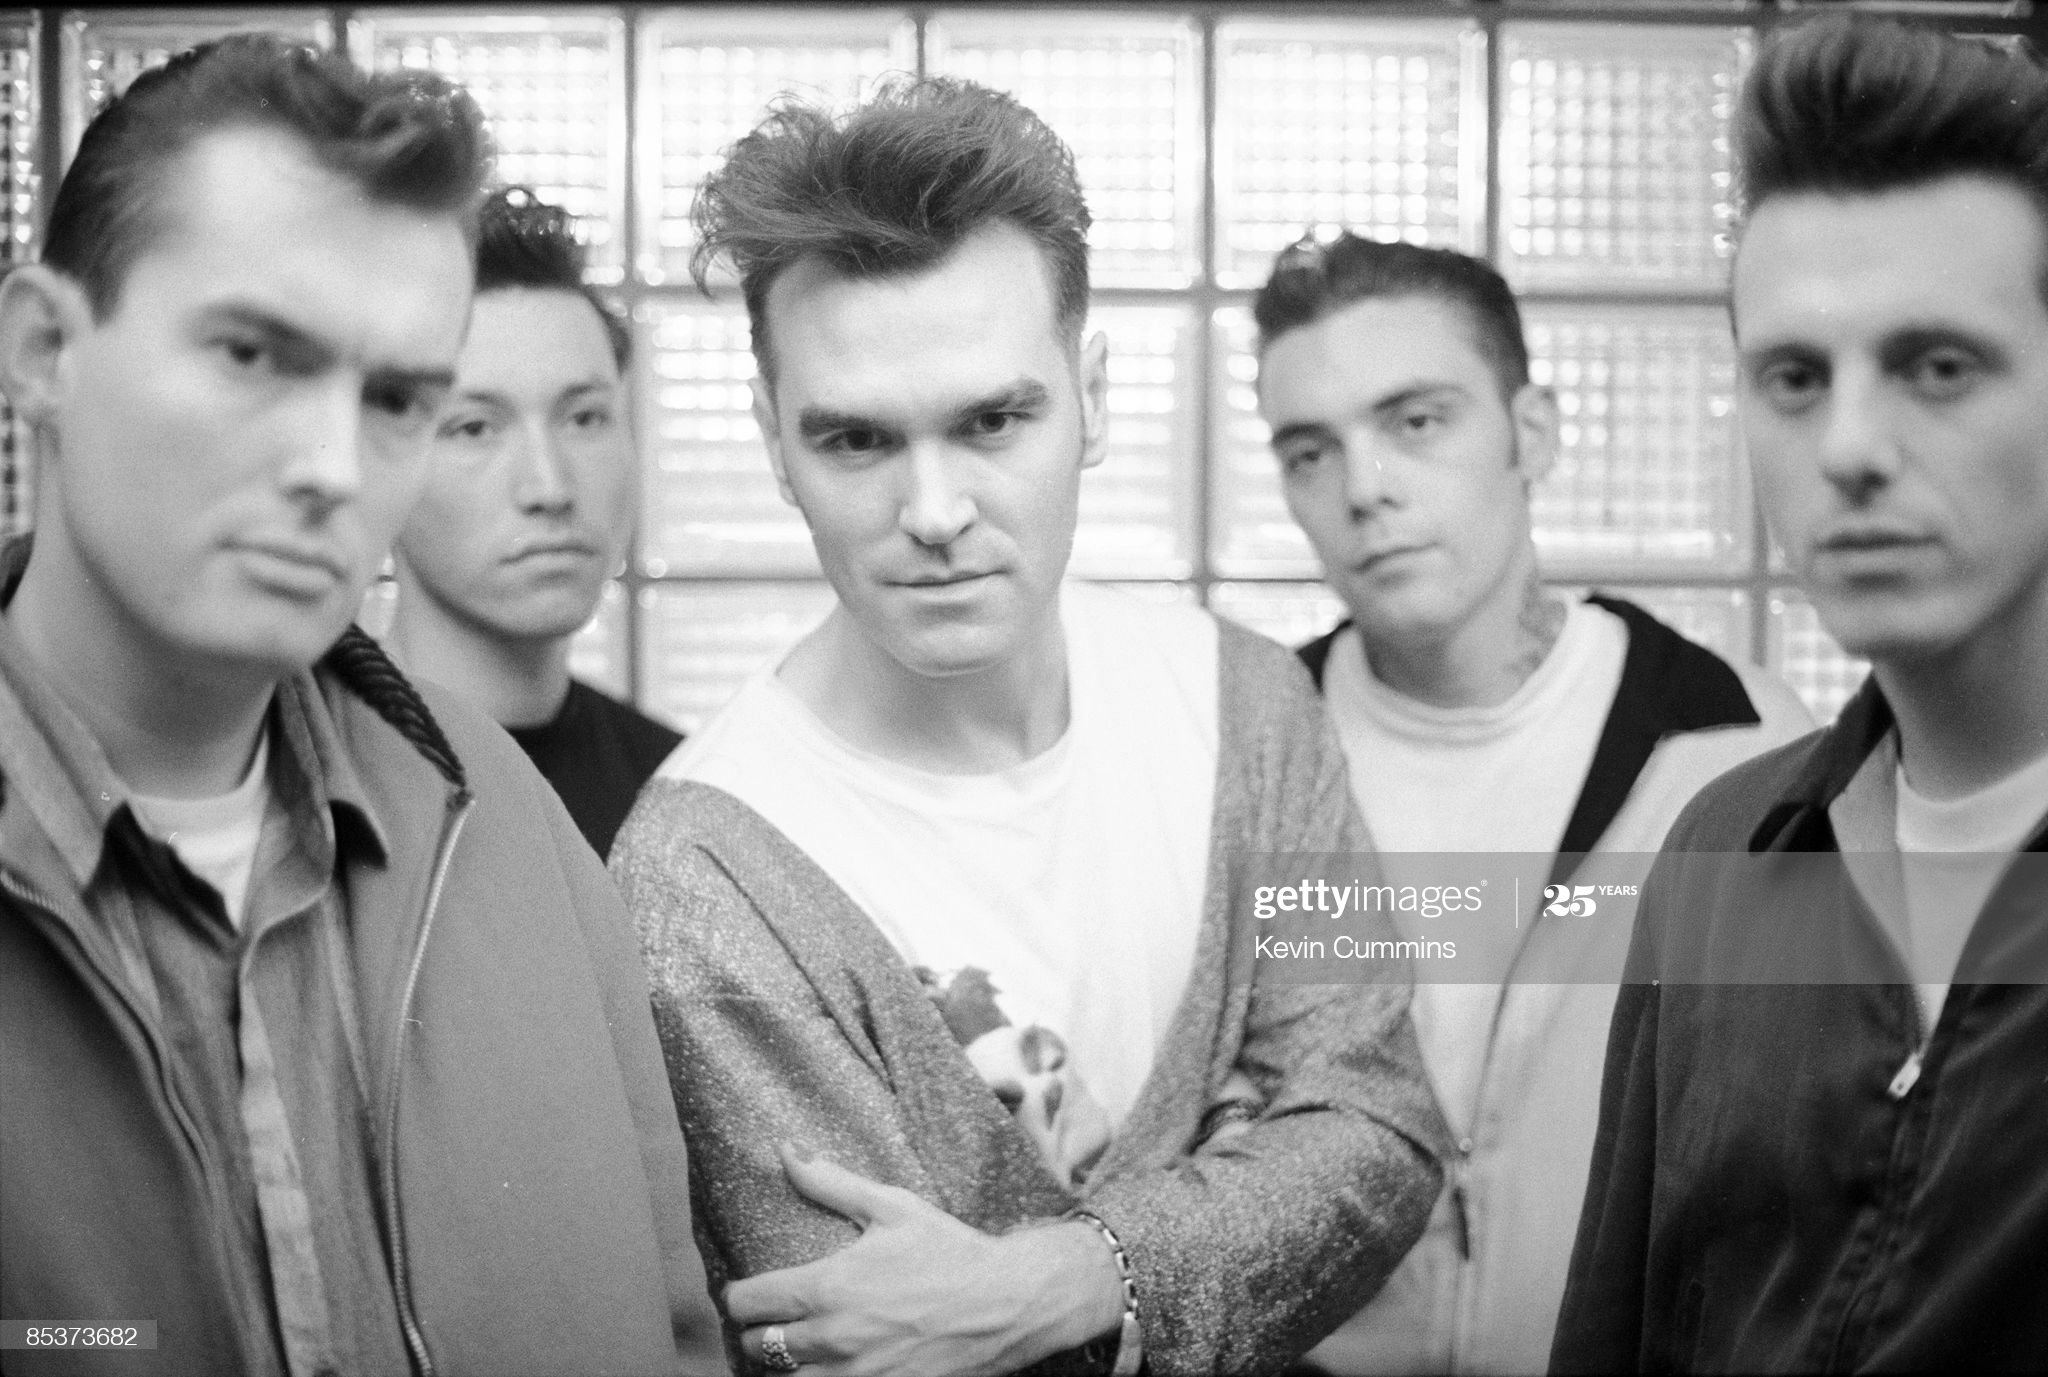 Morrissey Koln 1st May 1991(i)  Kevin Cummins.jpg